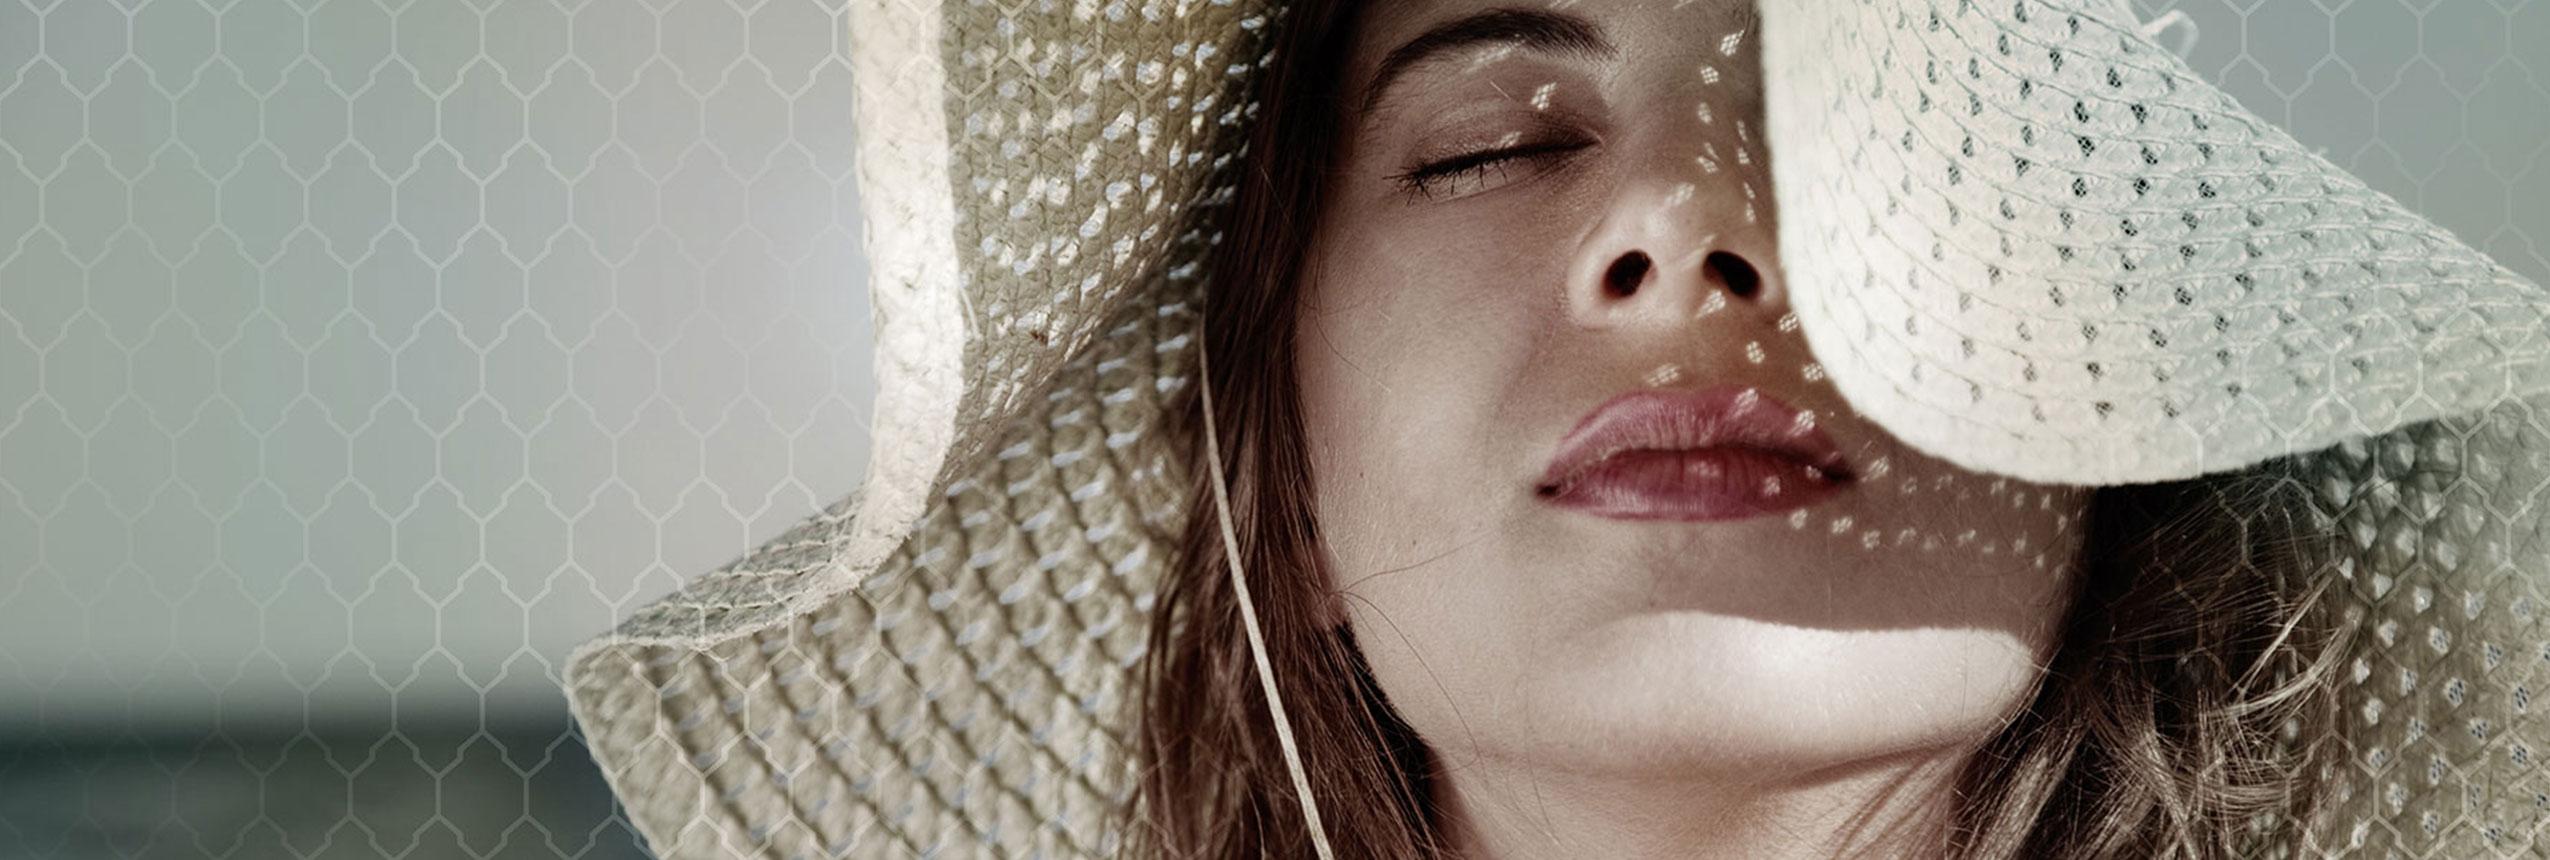 hautkrebsvorsorge hautkrebstherapie muenchen - Hautkrebs